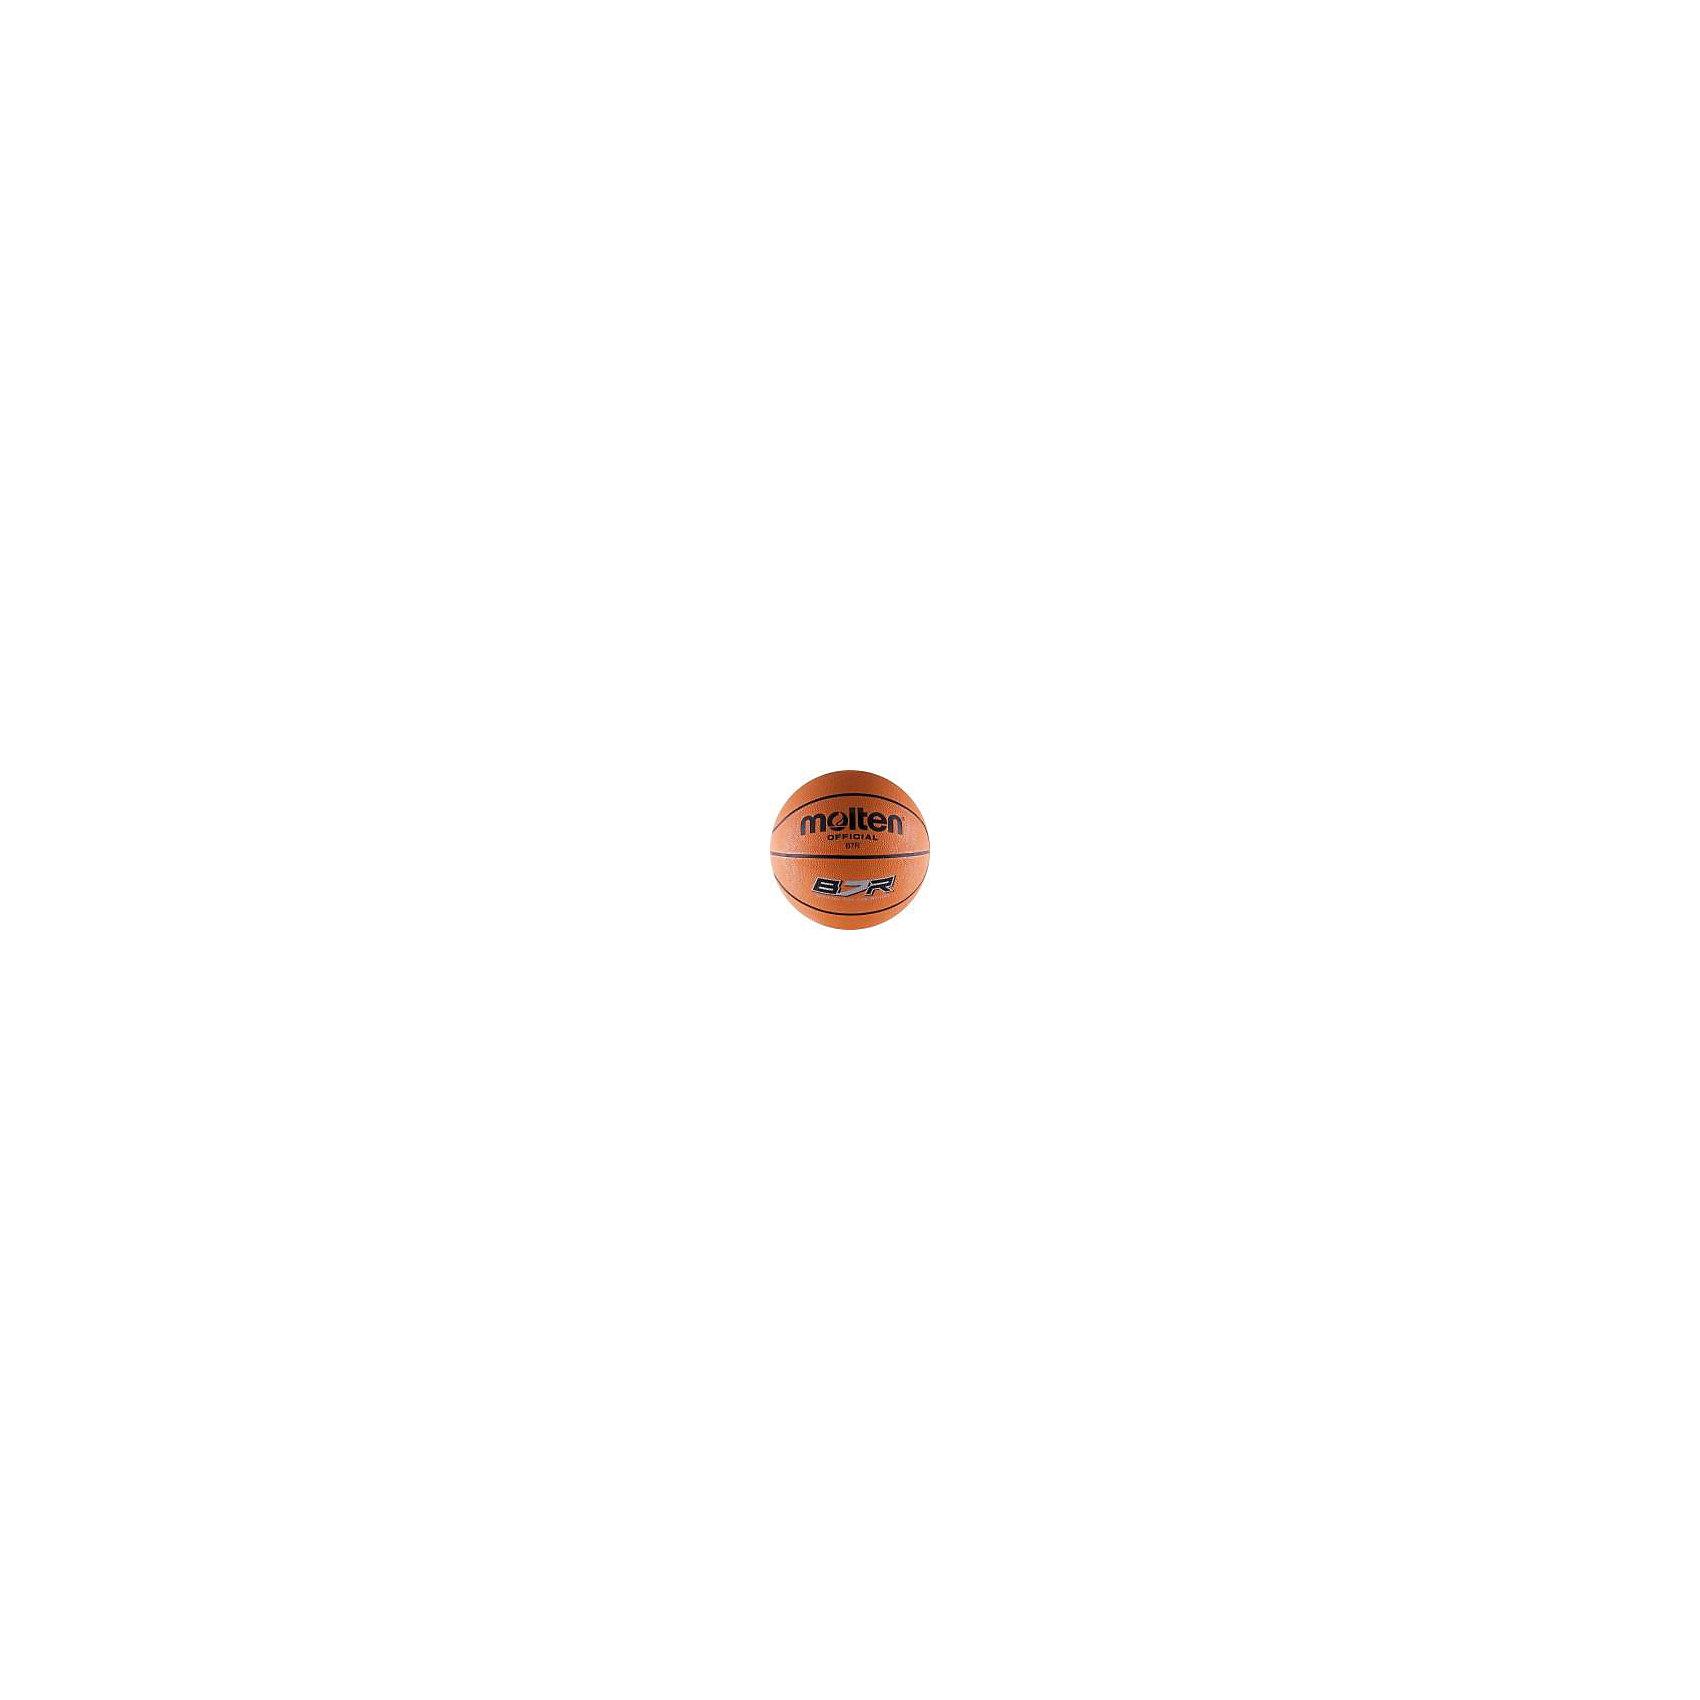 - Баскетбольный мяч, B7R, р. 7, резина, оранж., MOLTEN цена и фото